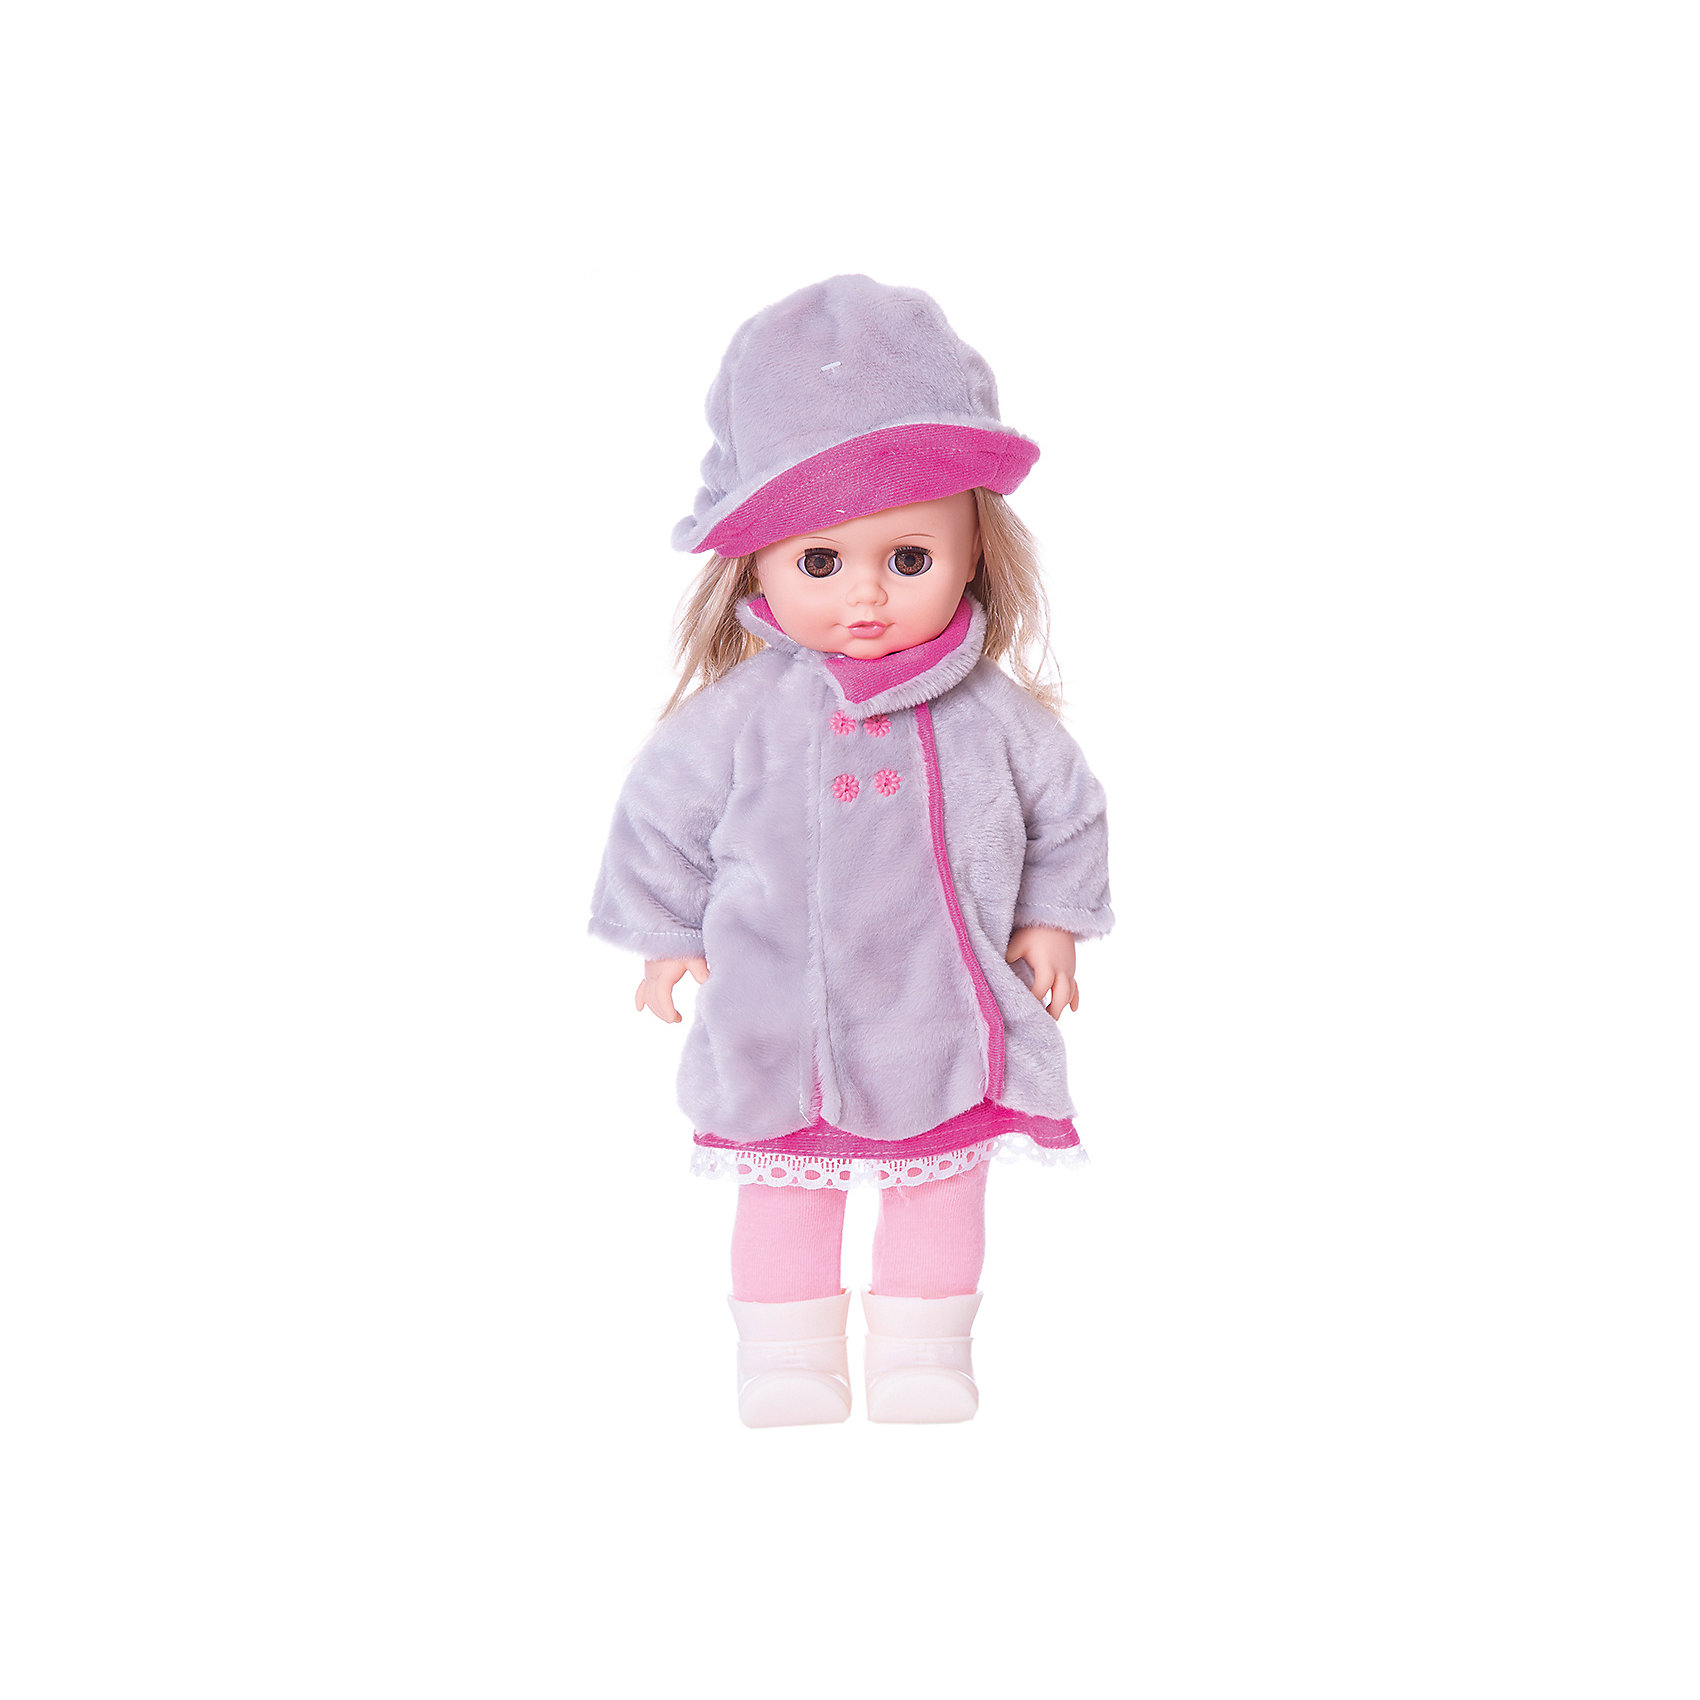 Весна Кукла Инна 13, со звуком, Весна кукла весна алсу 35 см со звуком в1634 о